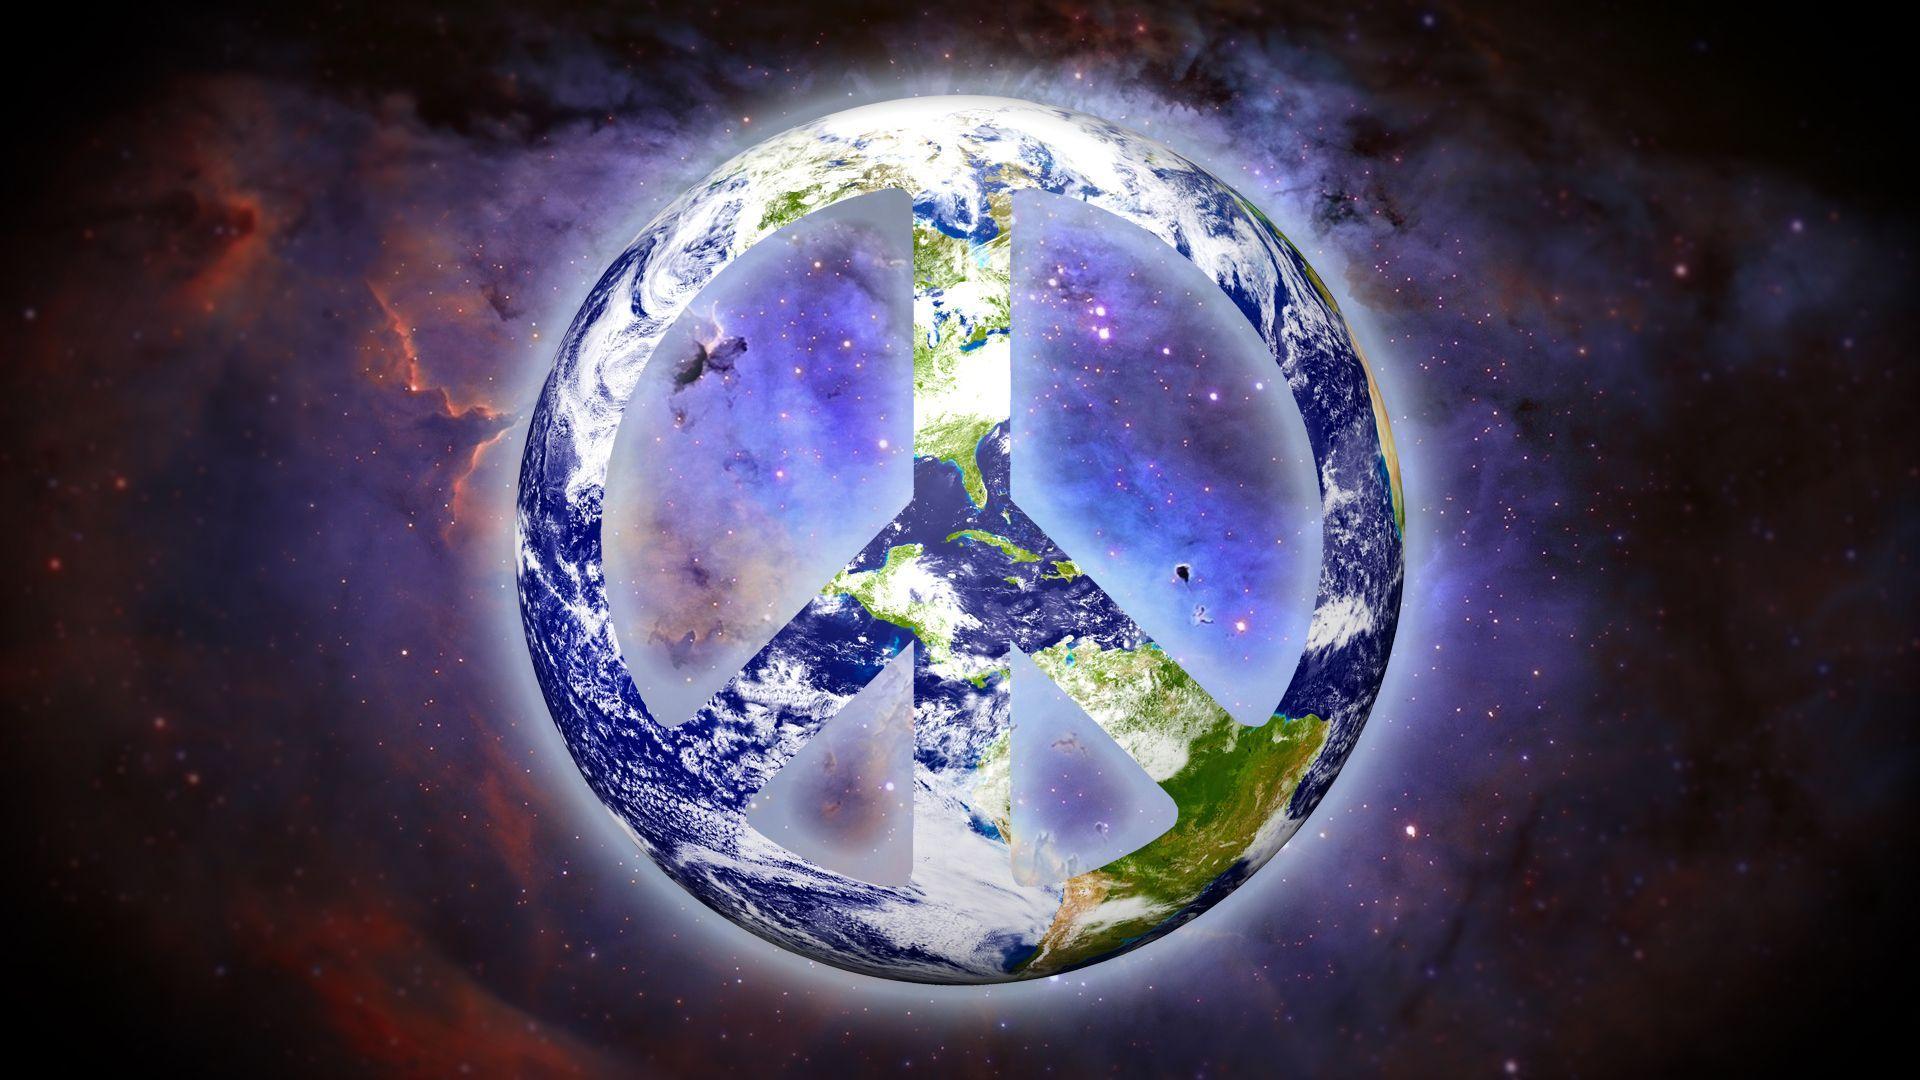 World Peace Wallpaper 1920x1080